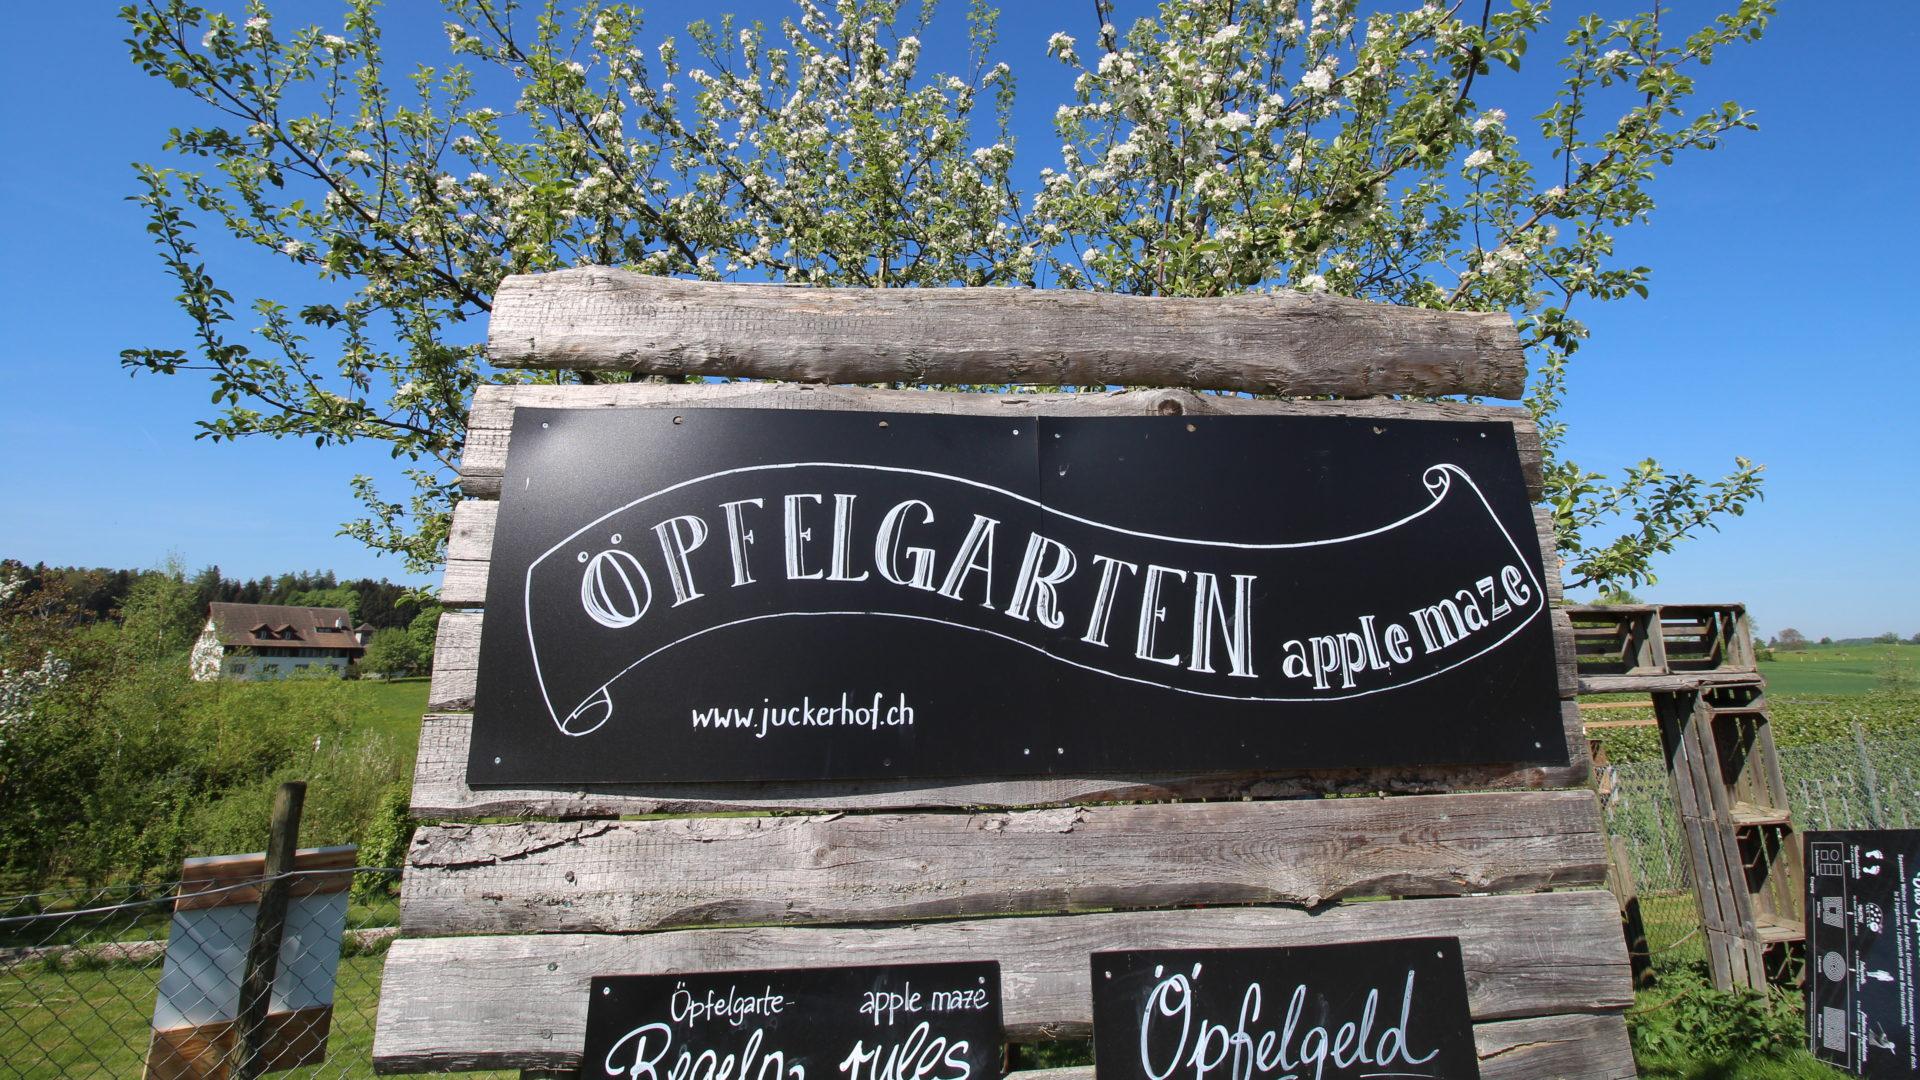 Juckerhof ÖpfelGarte Tafel